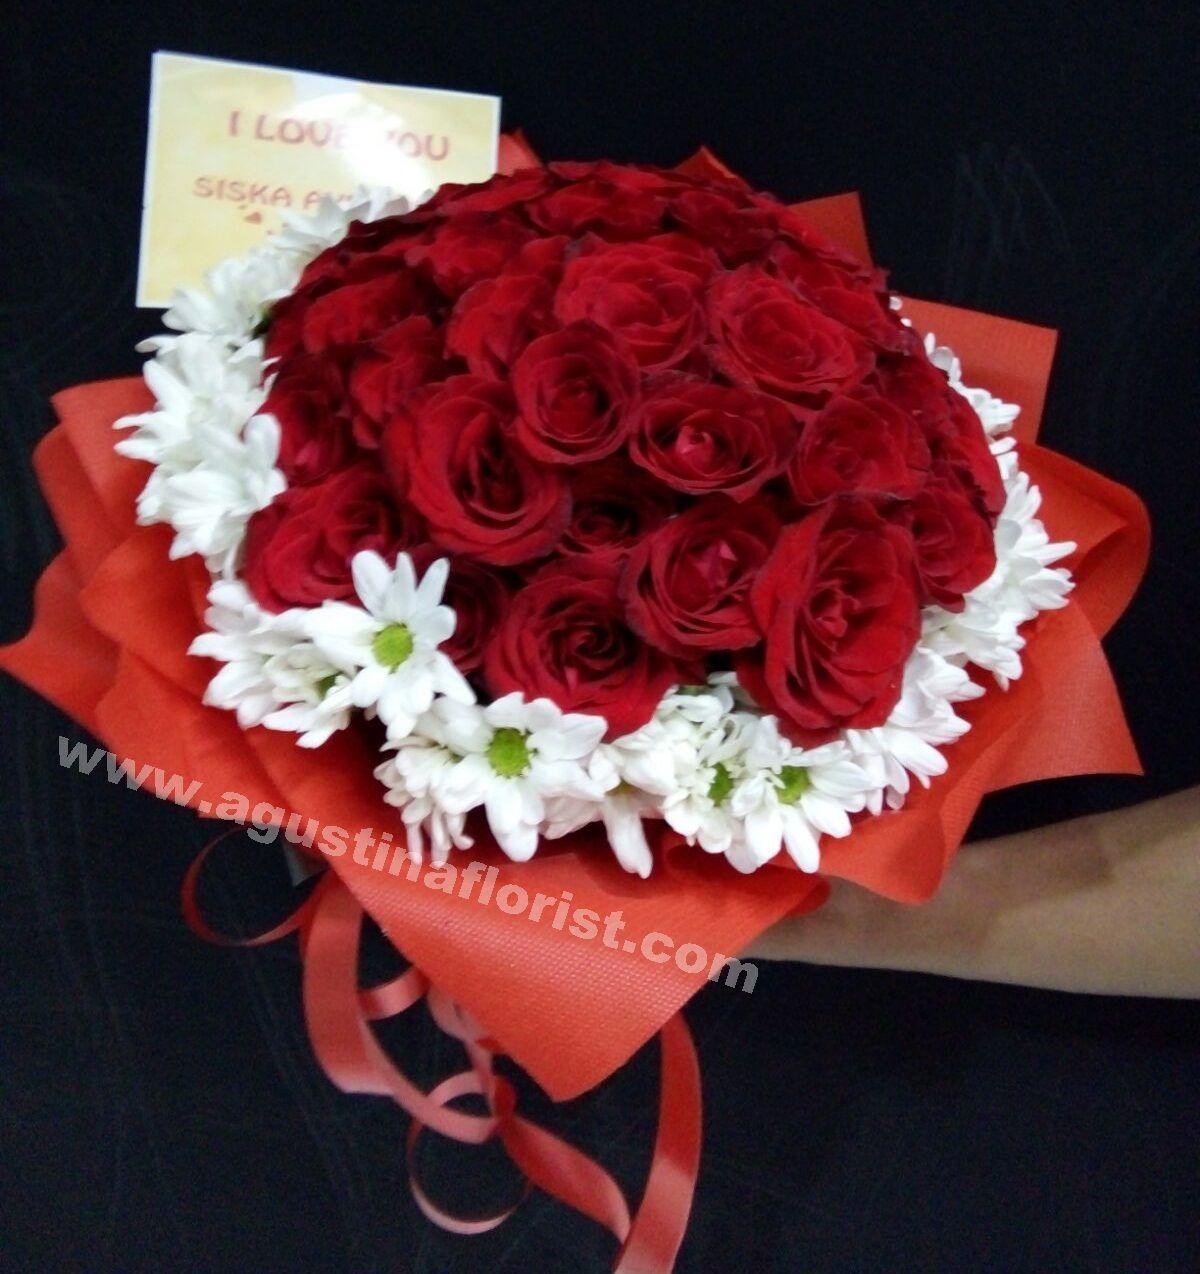 Harga 1 Tangkai Bunga Mawarharga Bunga Mawar Per Tangkai Di